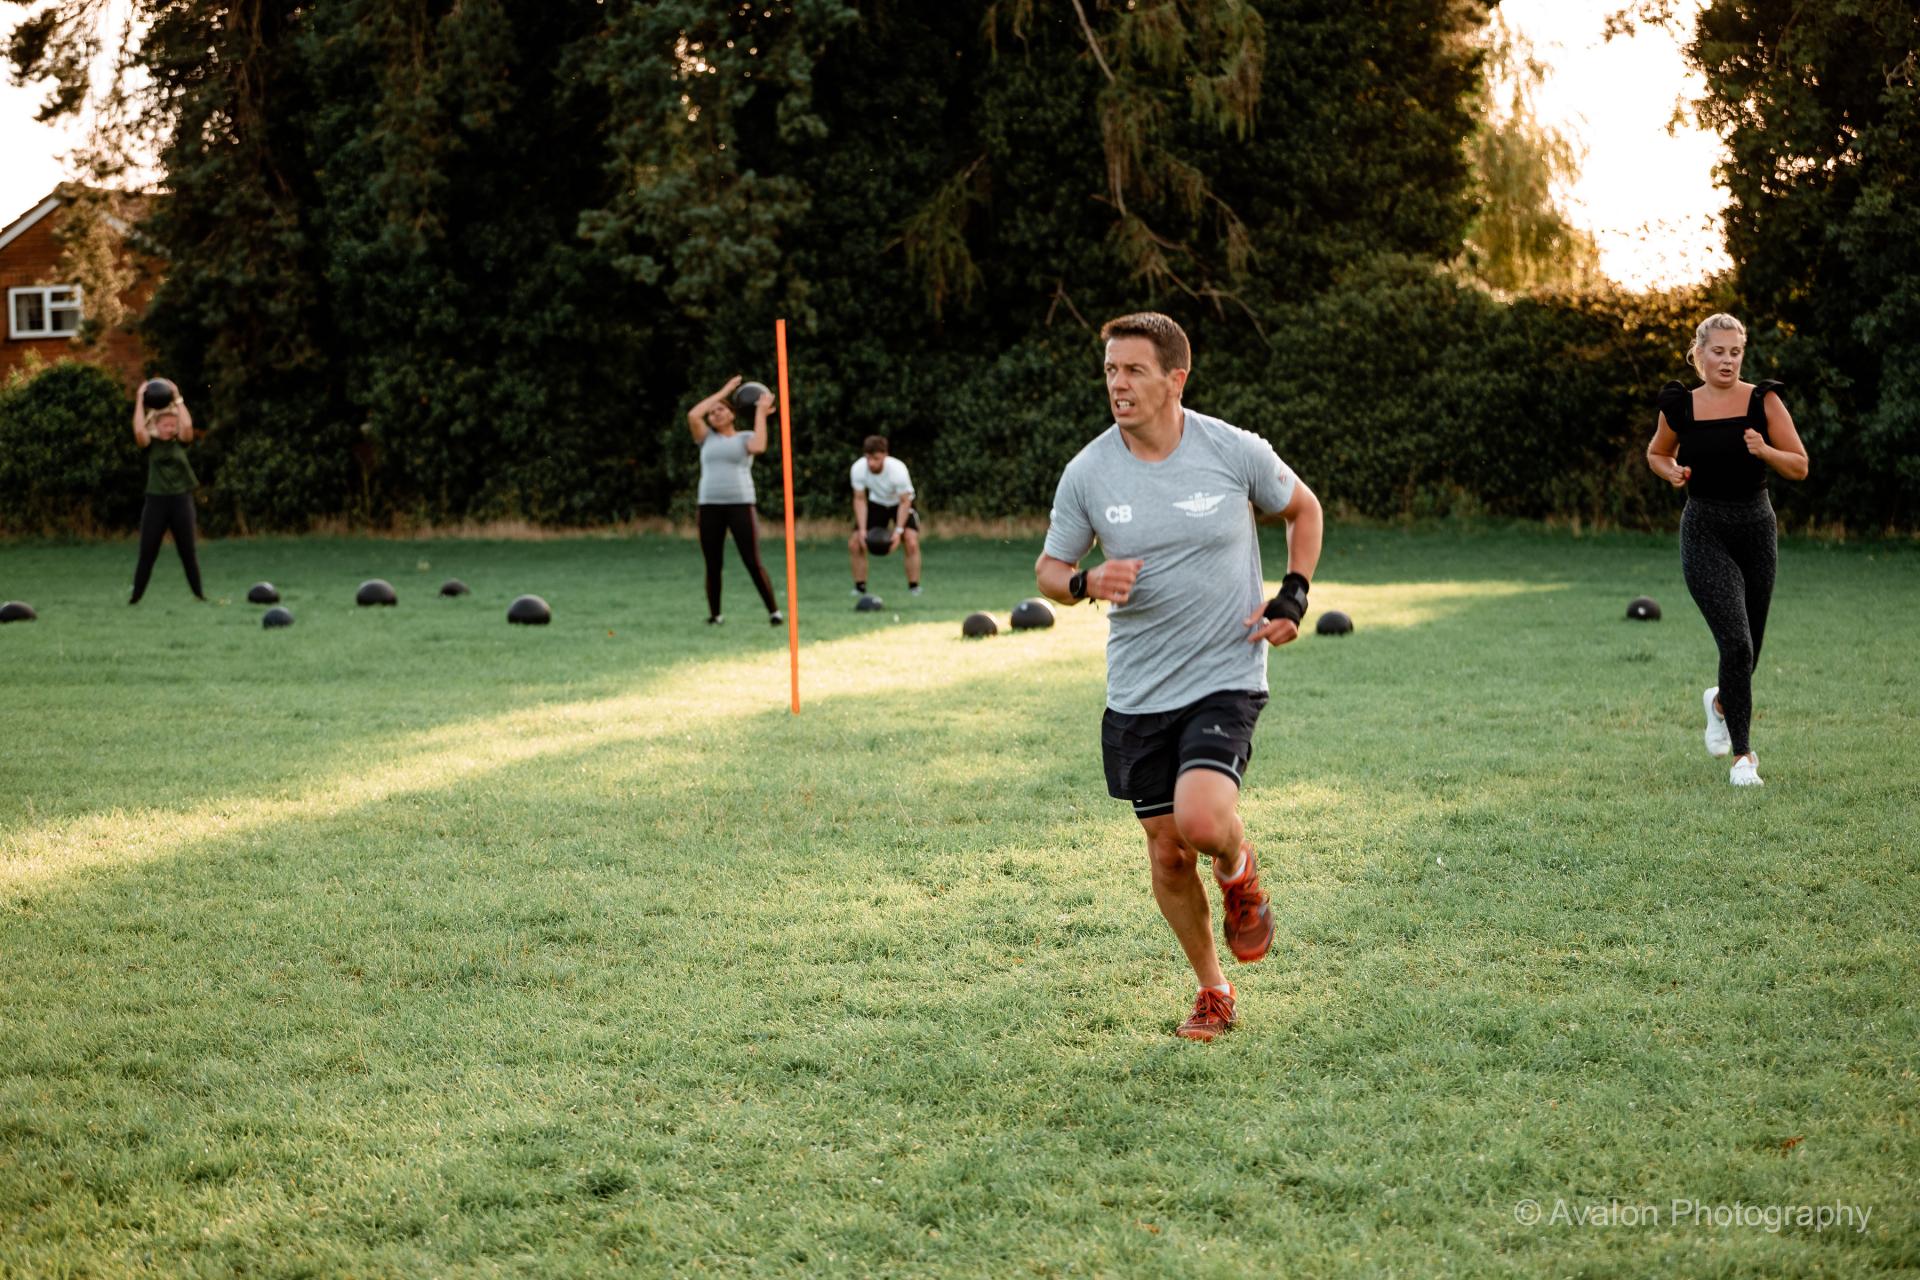 Training at camp